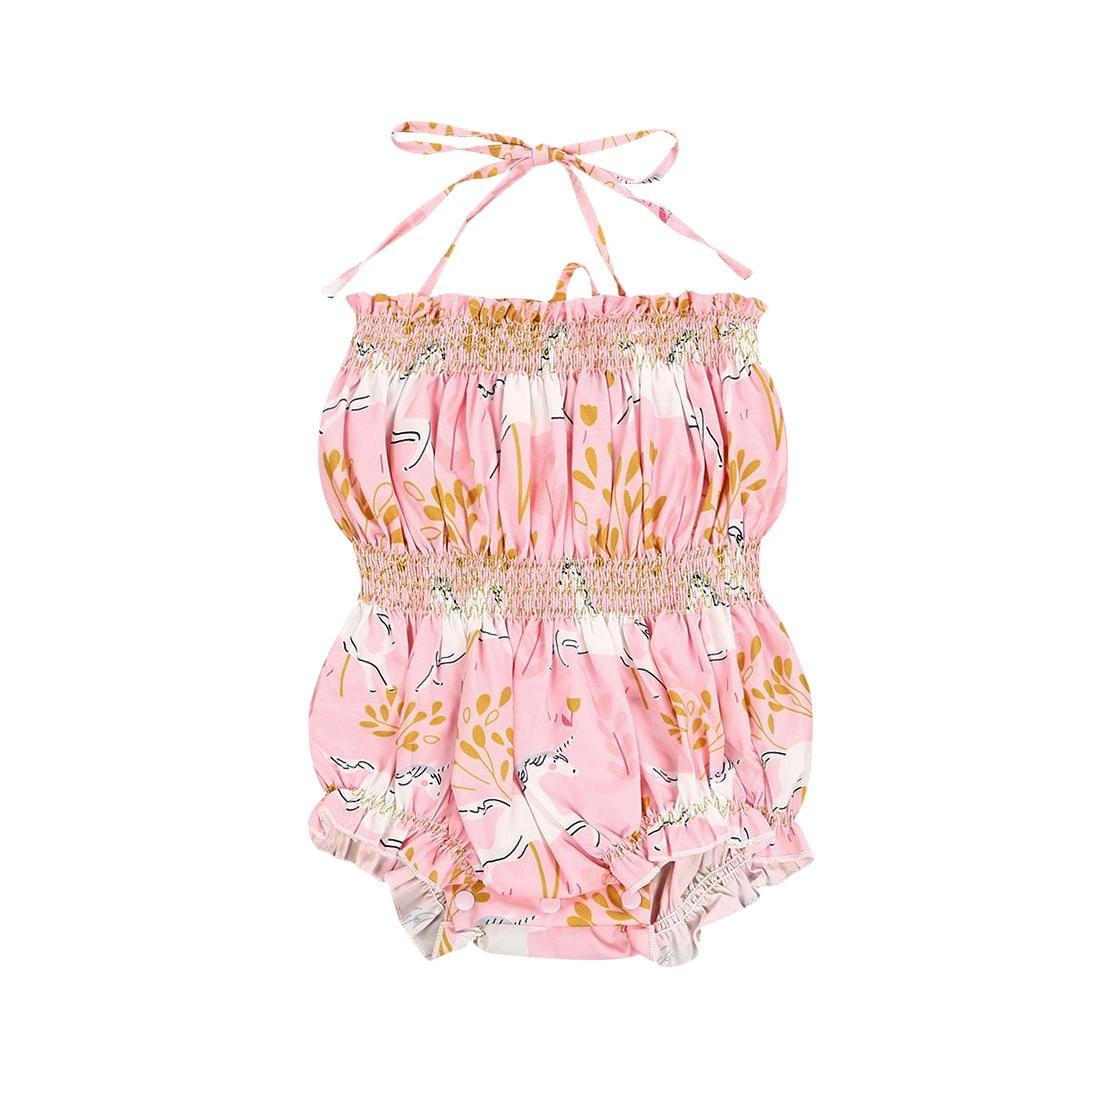 2018 Newborn Baby Girls Unicorn Sleeveless Halter Romper Floral Sunsuit Summer Kids Clothes Outfits